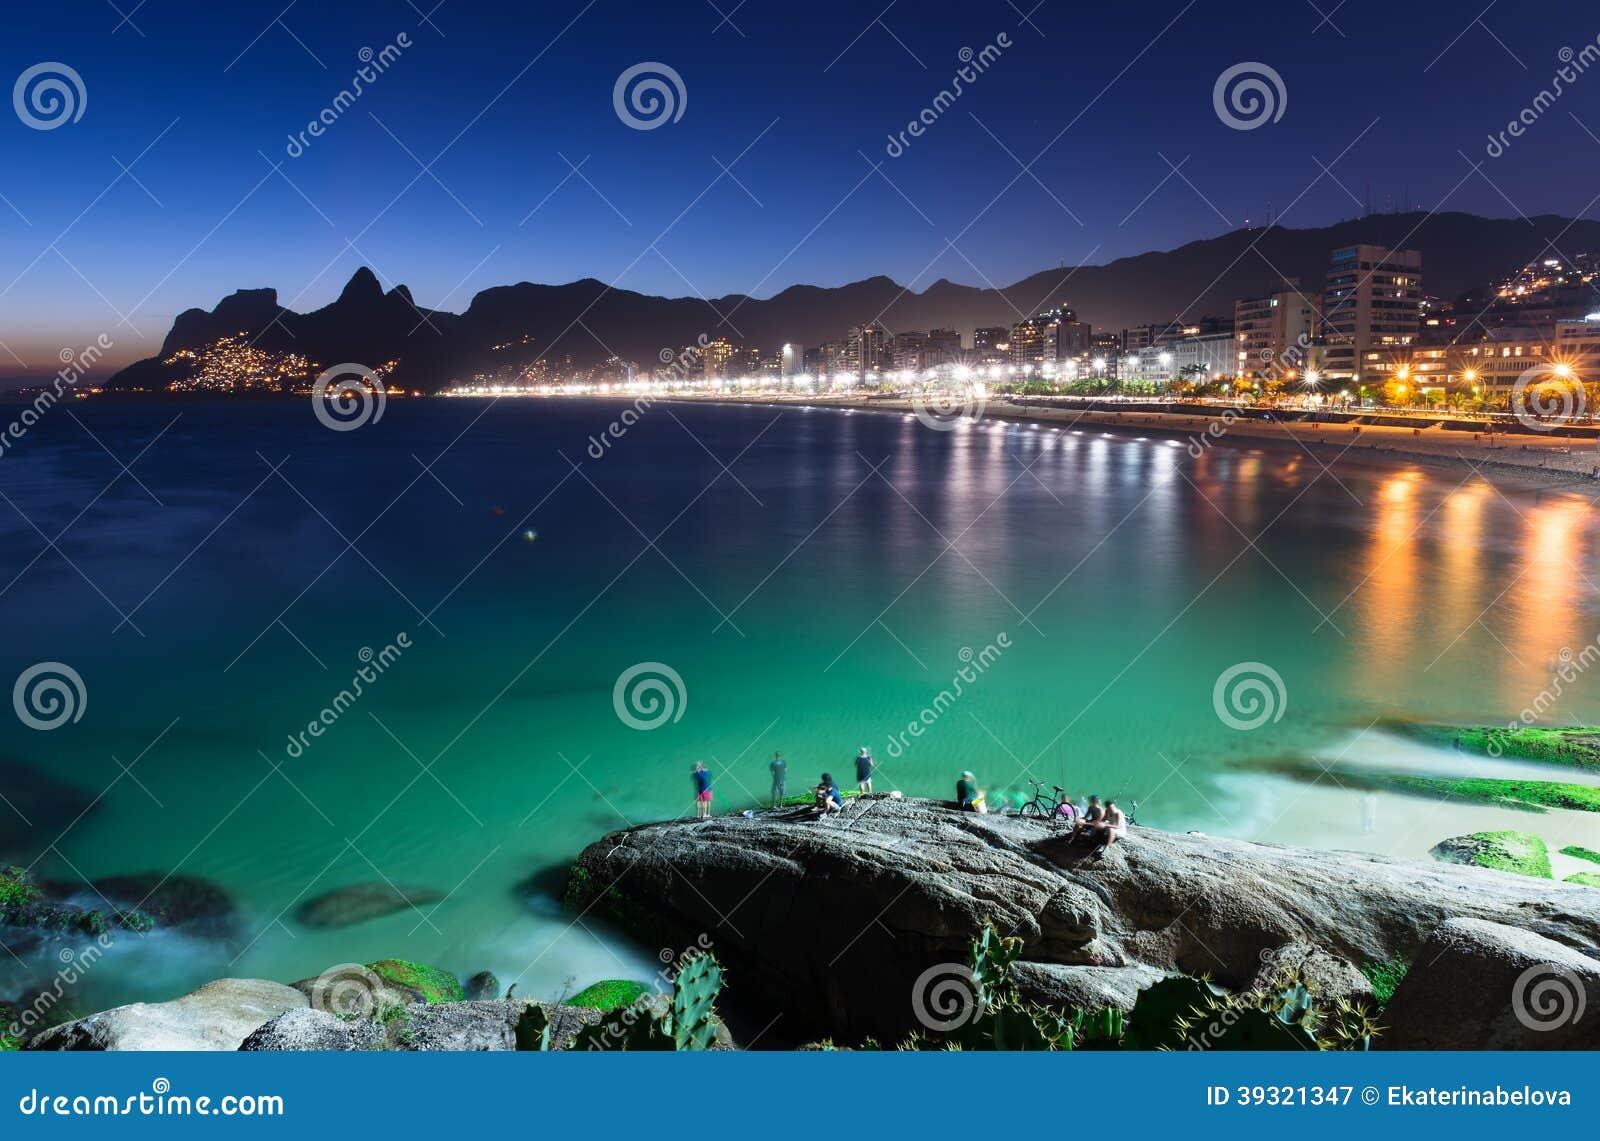 Night view of Ipanema in Rio de Janeiro